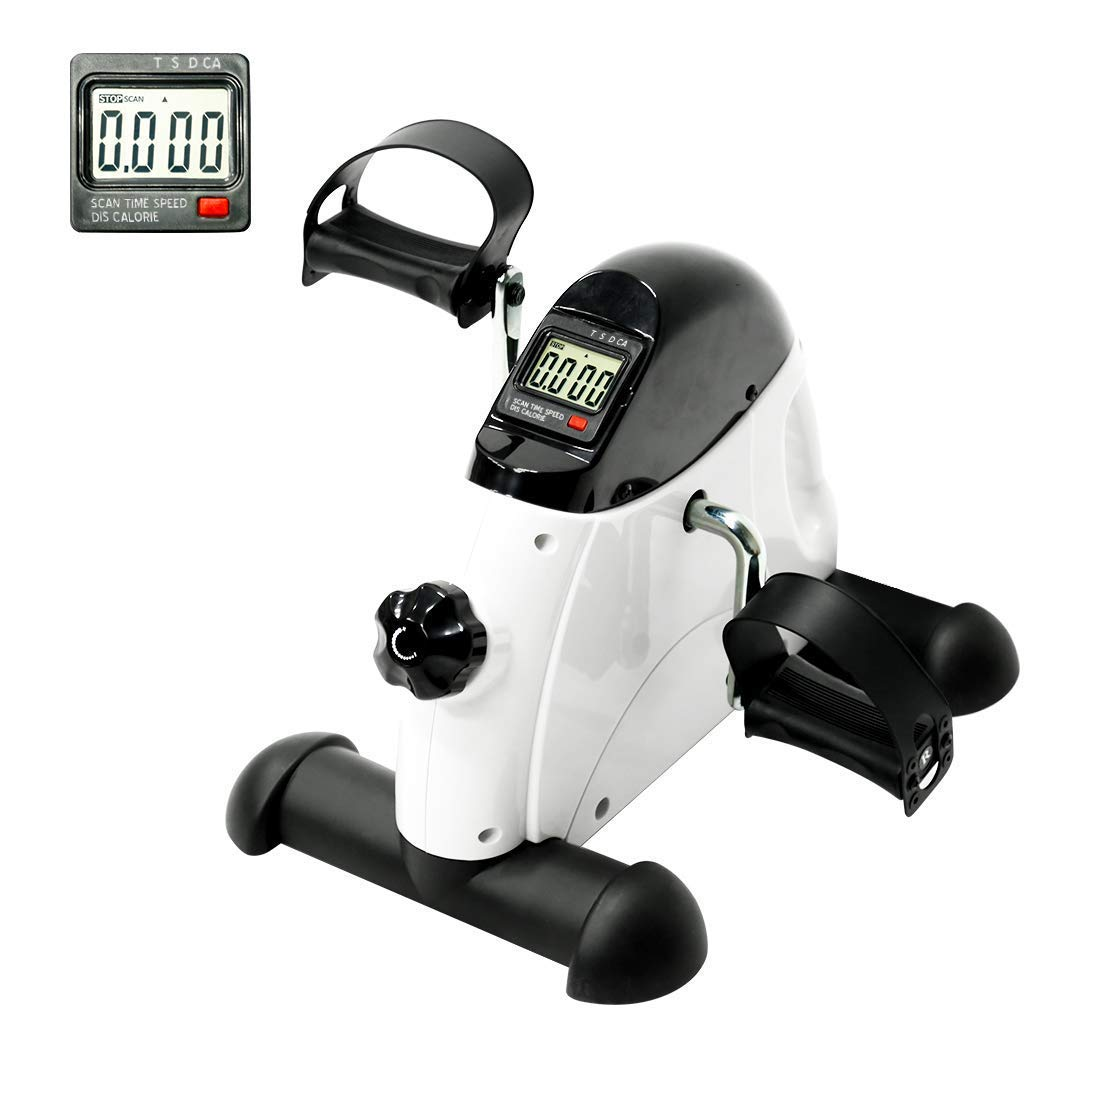 YOSUDA Under Desk Bike Pedal Exerciser - Mini Cycle Exercise Bike for Leg/Arm Pedder Portable